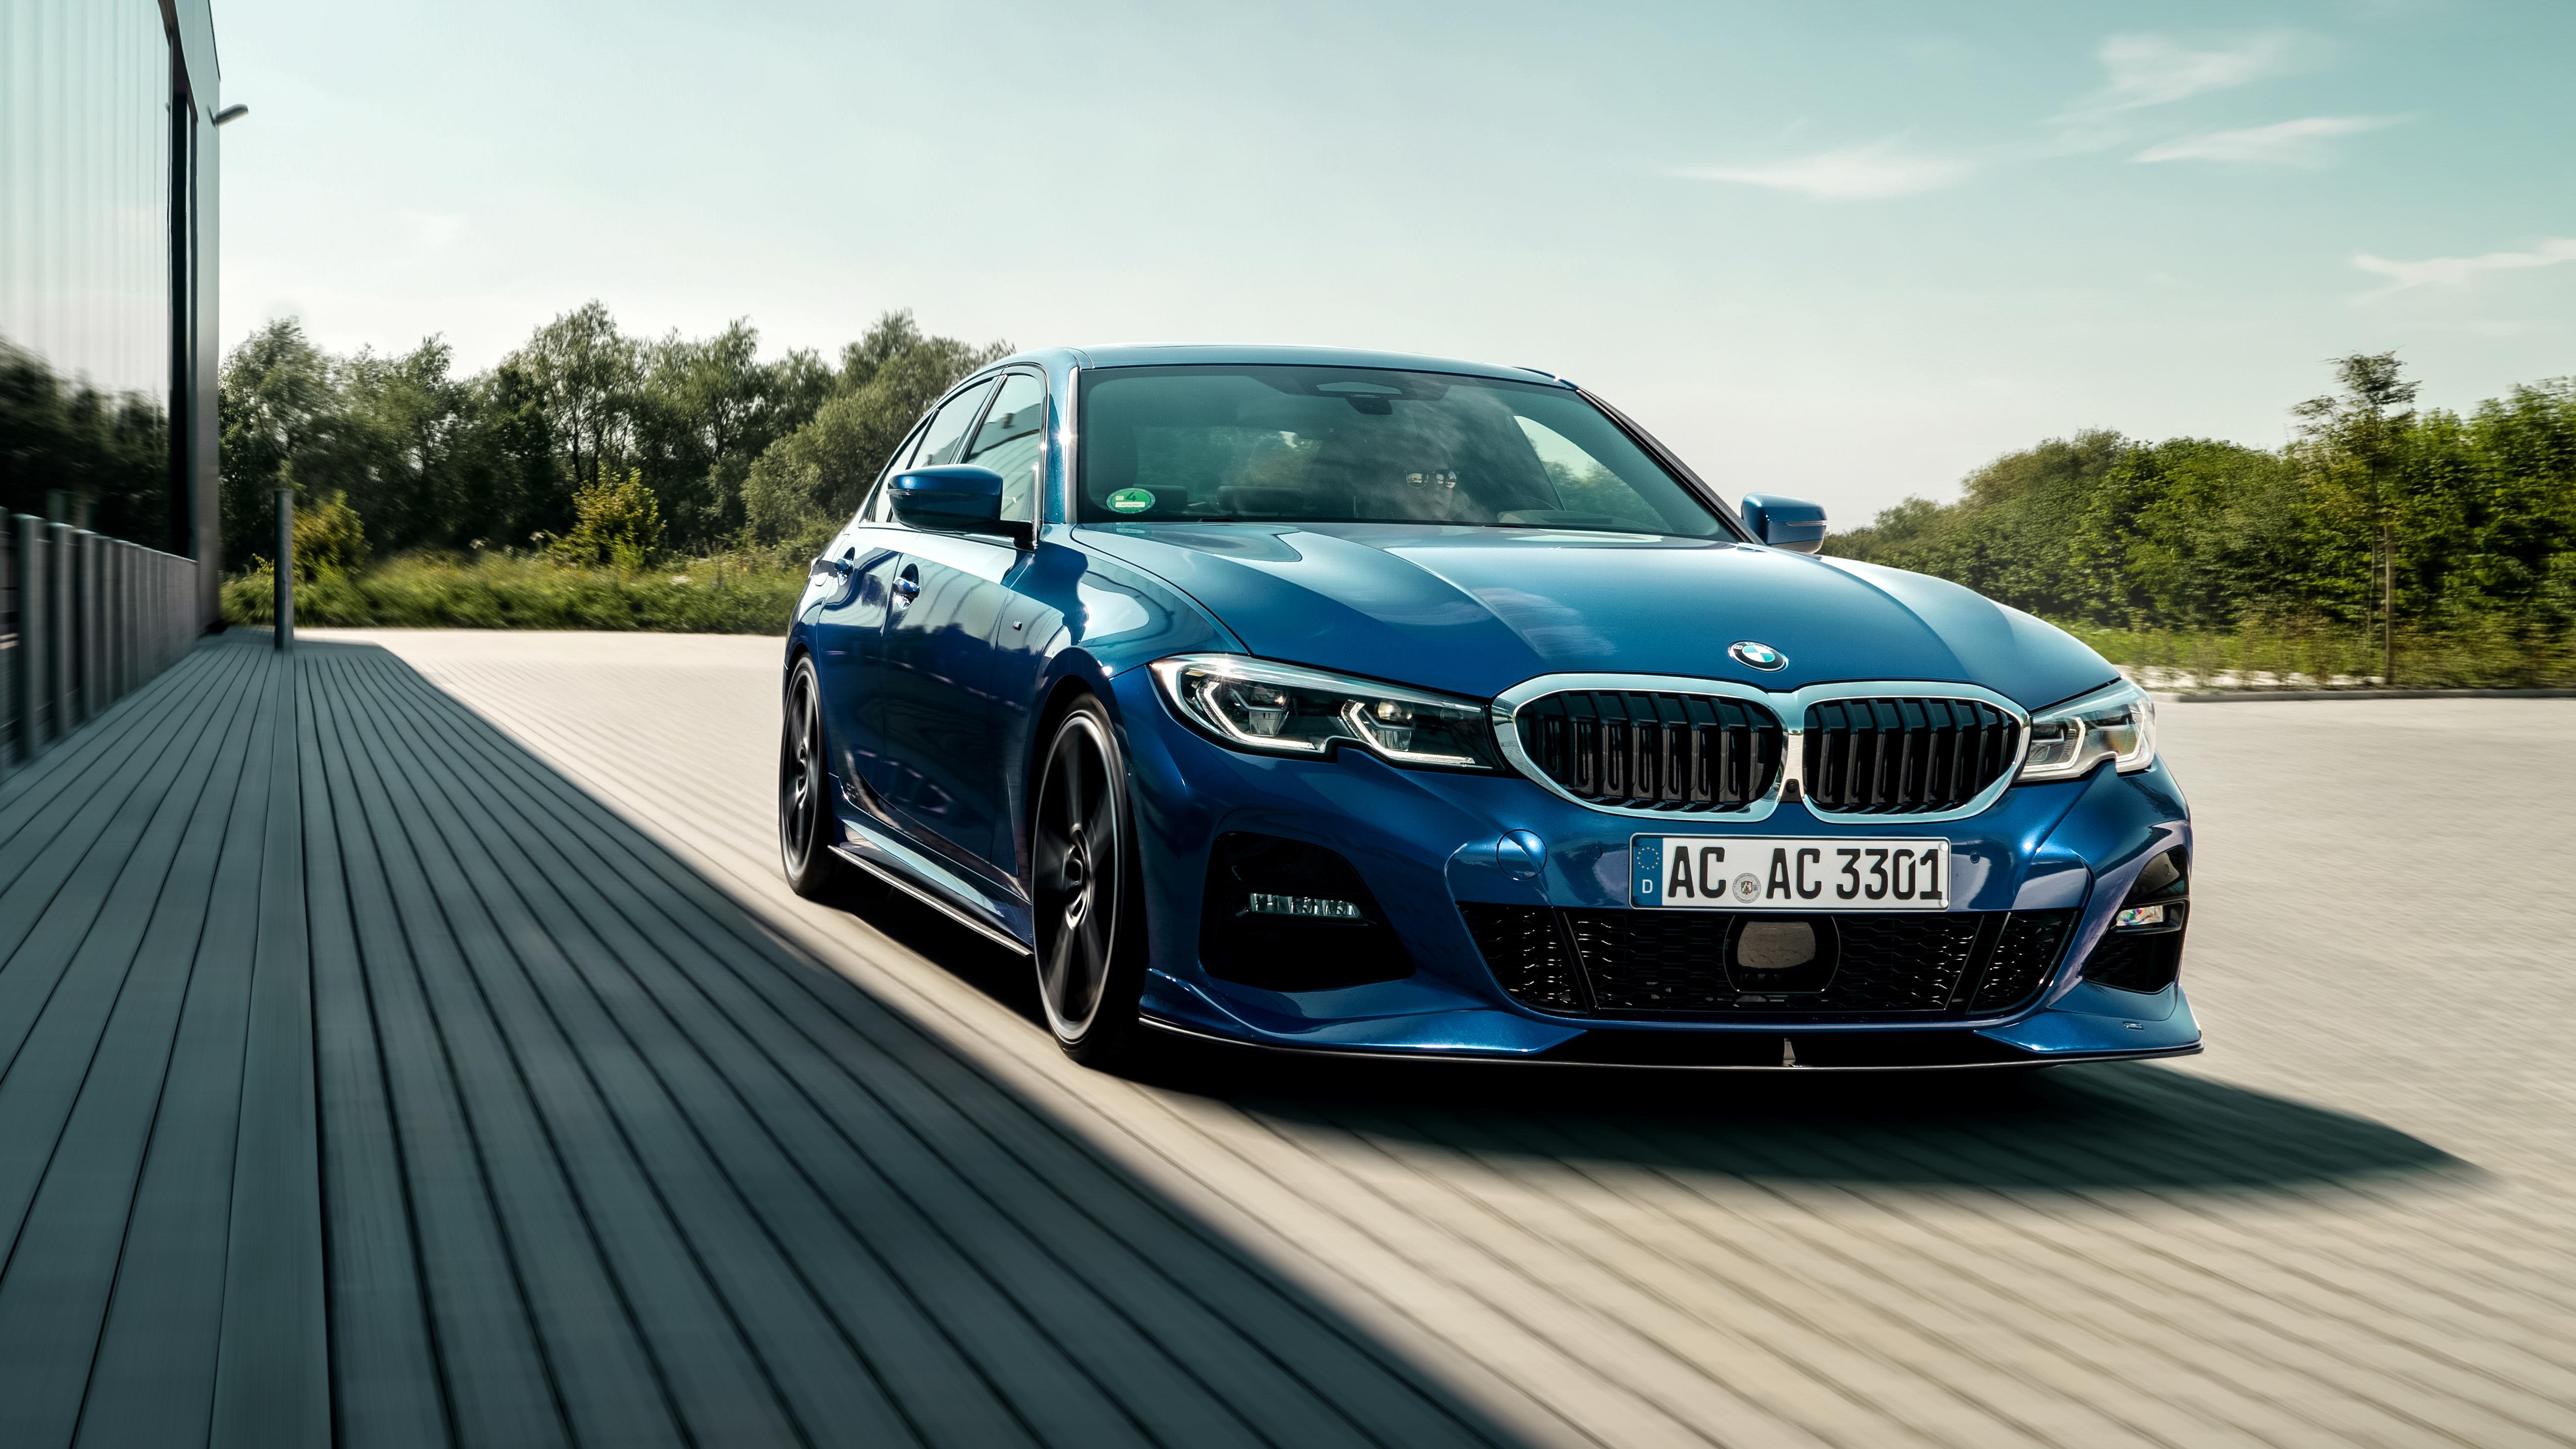 AC Schnitzer BMW 3 Series Sedan M Sport 2019 4K Wallpaper ...